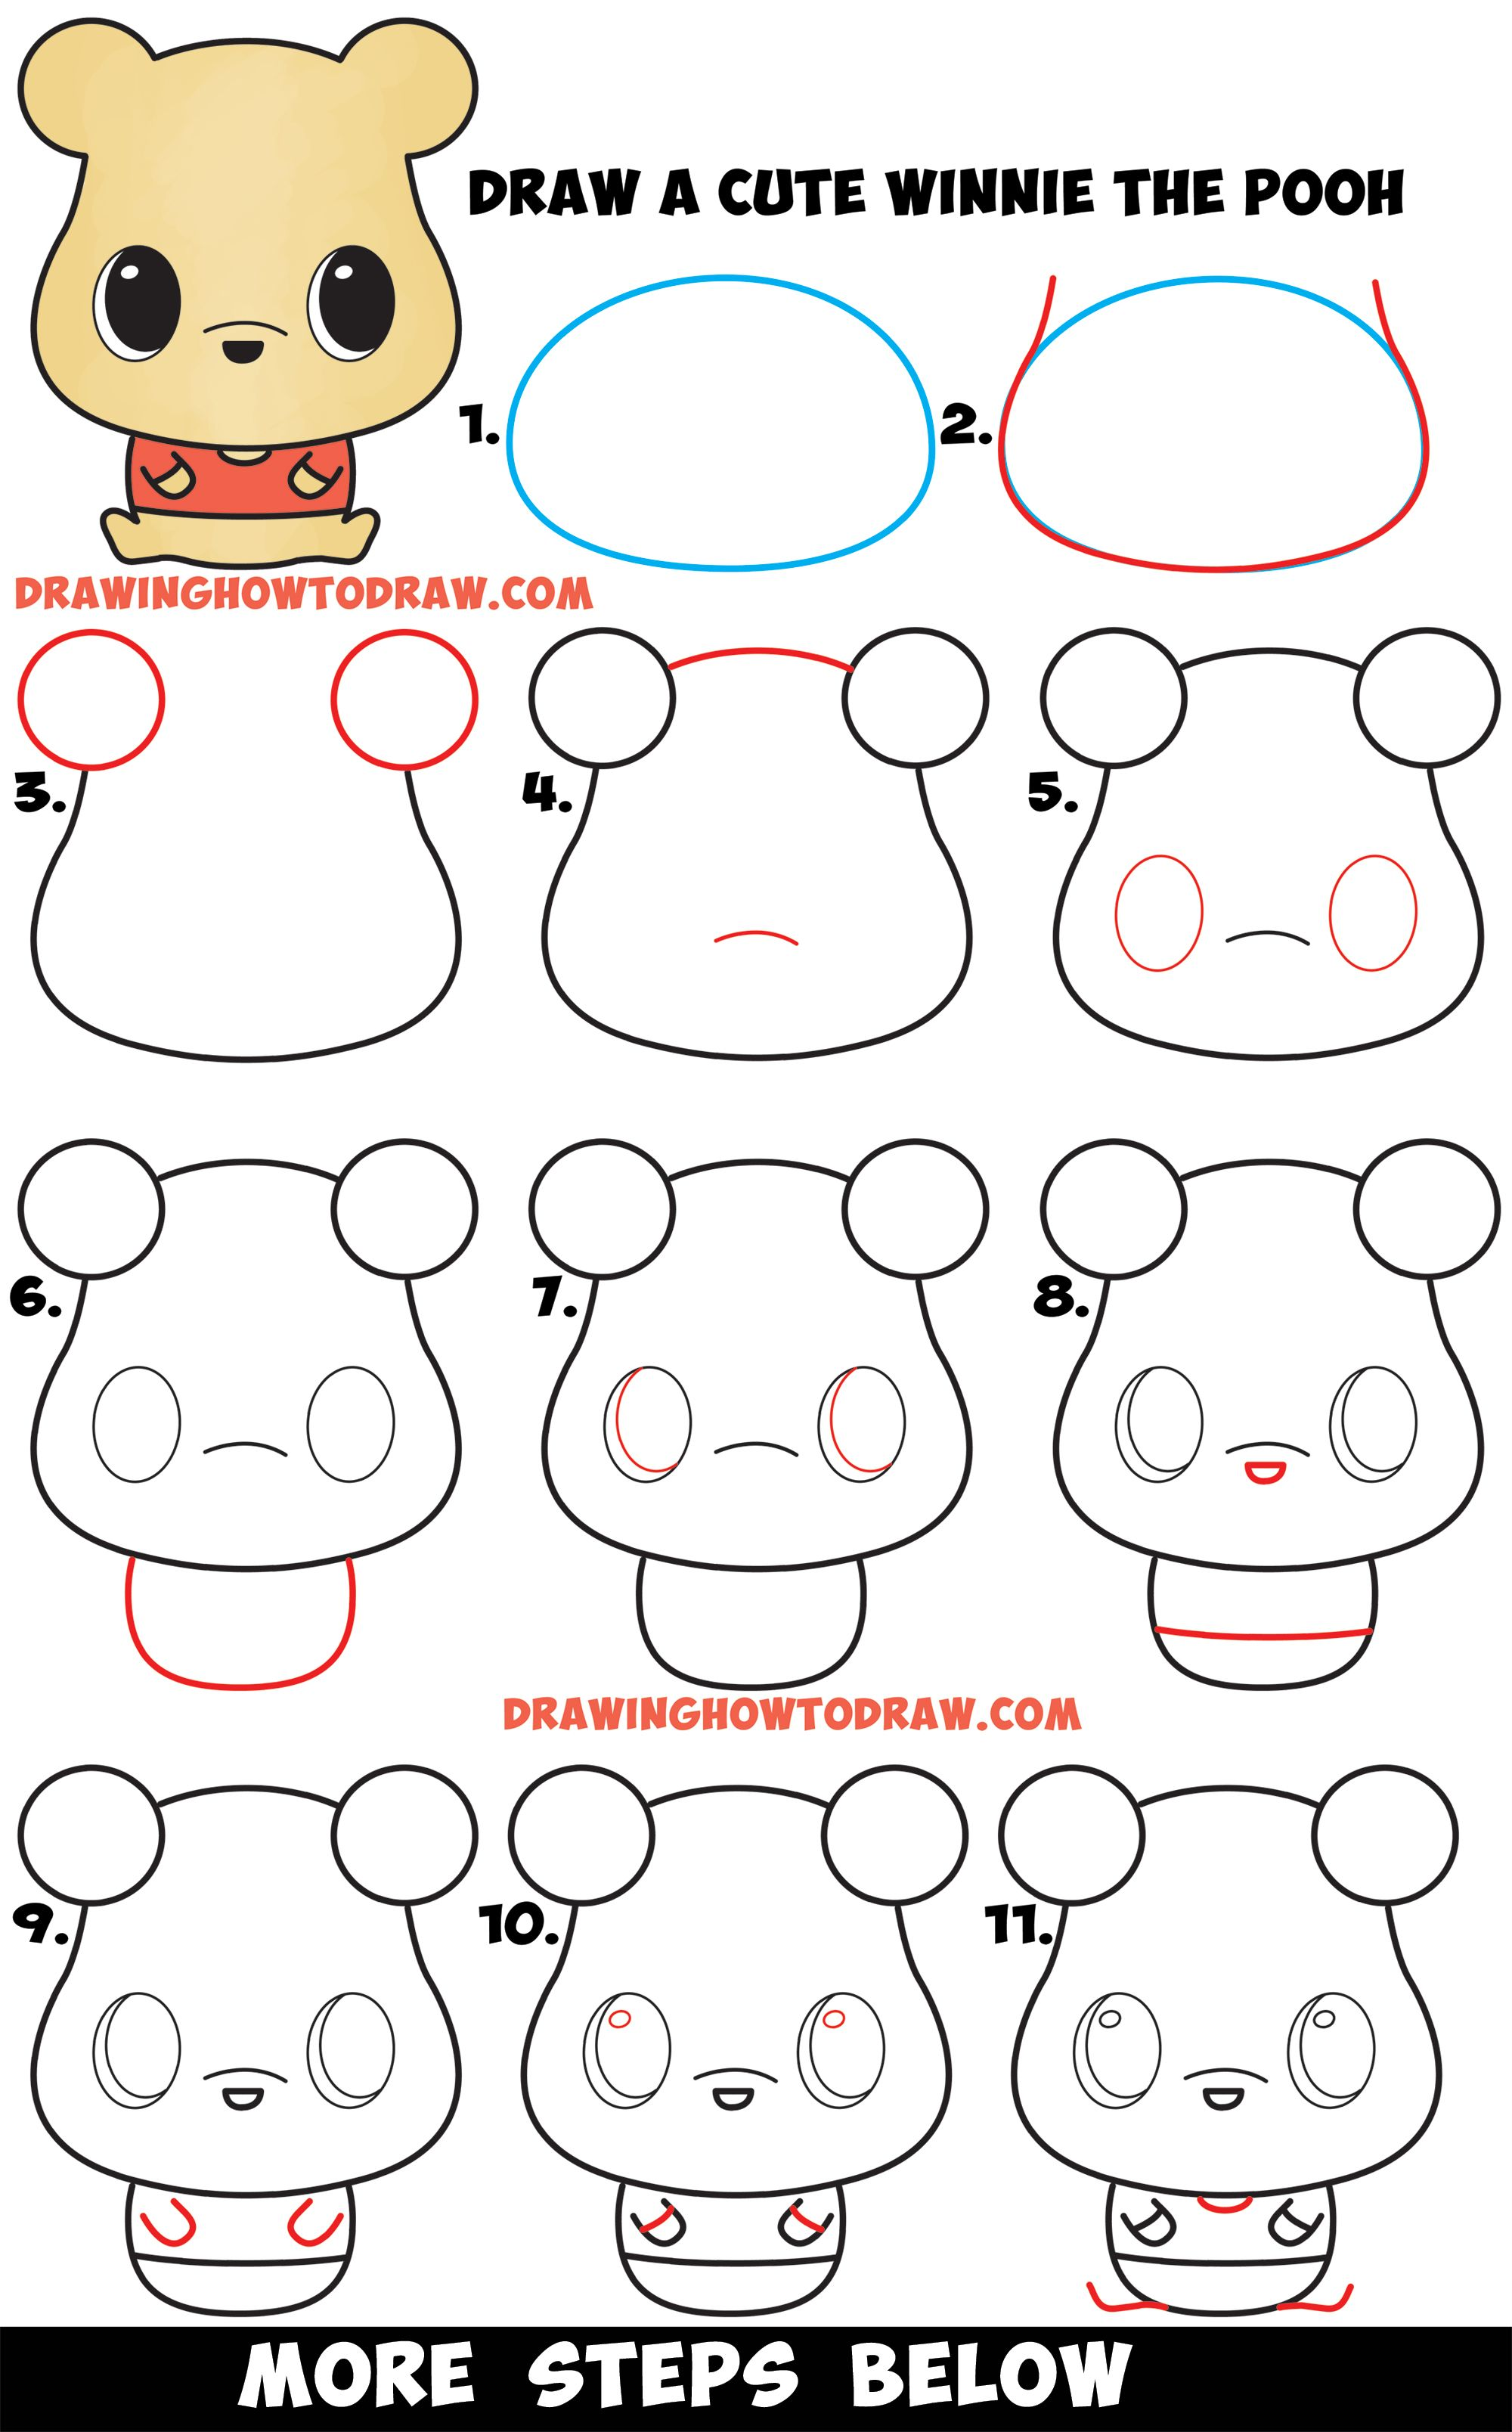 Cute Simple Acrylic Nail Designs: How To Draw A Cute Chibi / Kawaii Winnie The Pooh Easy